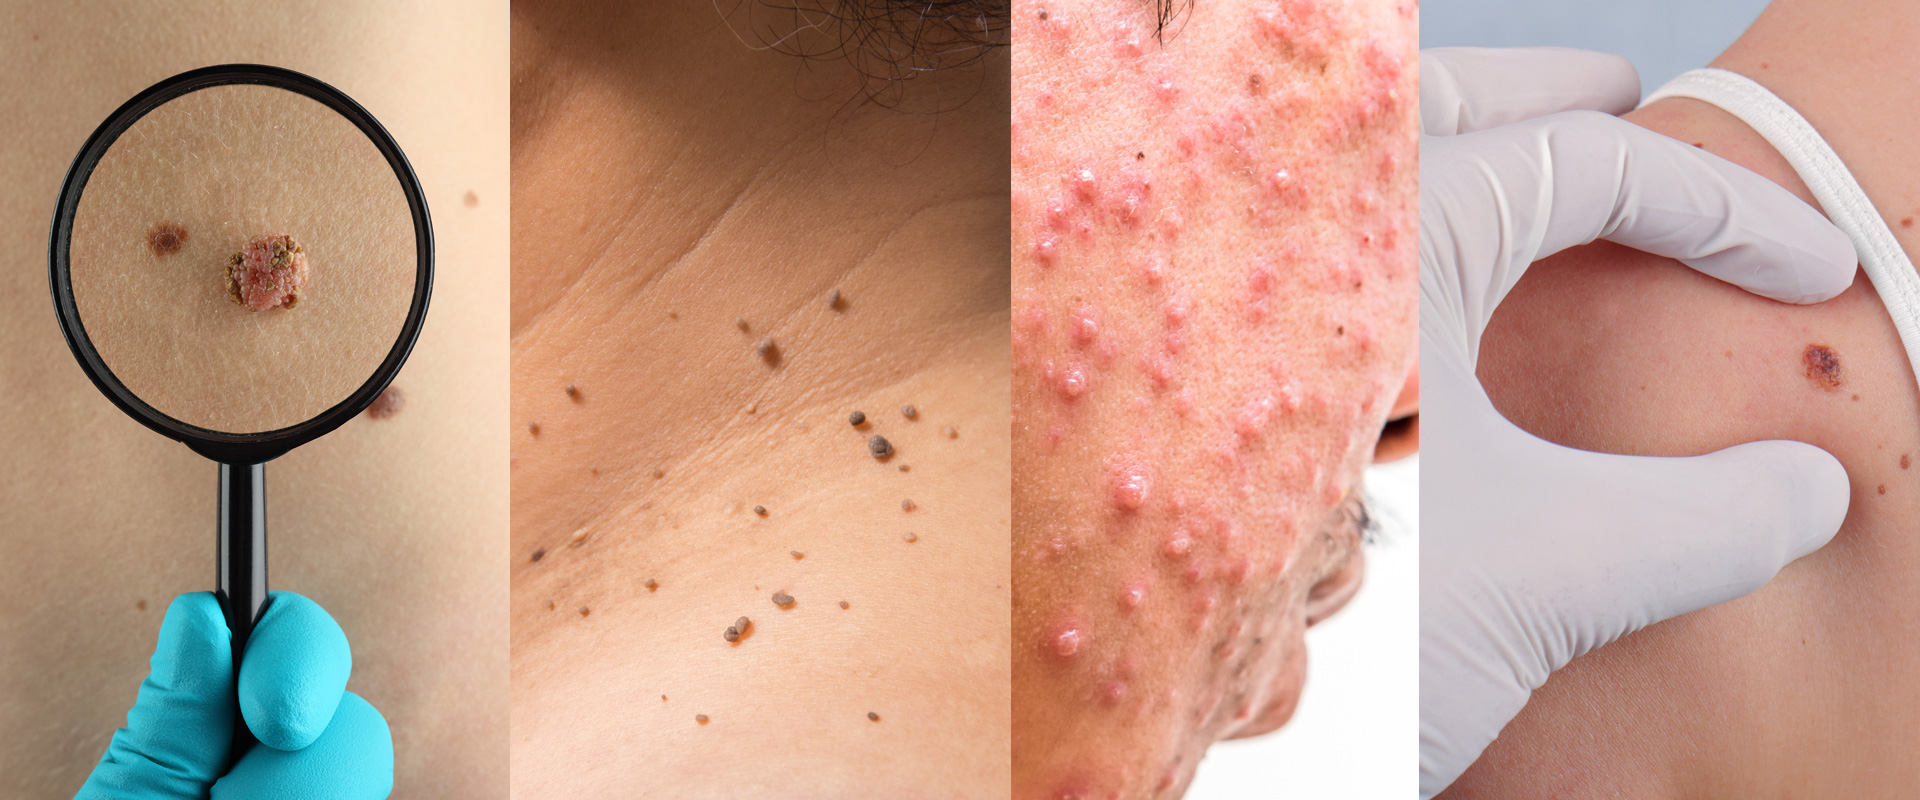 Dermatology | Skin Care